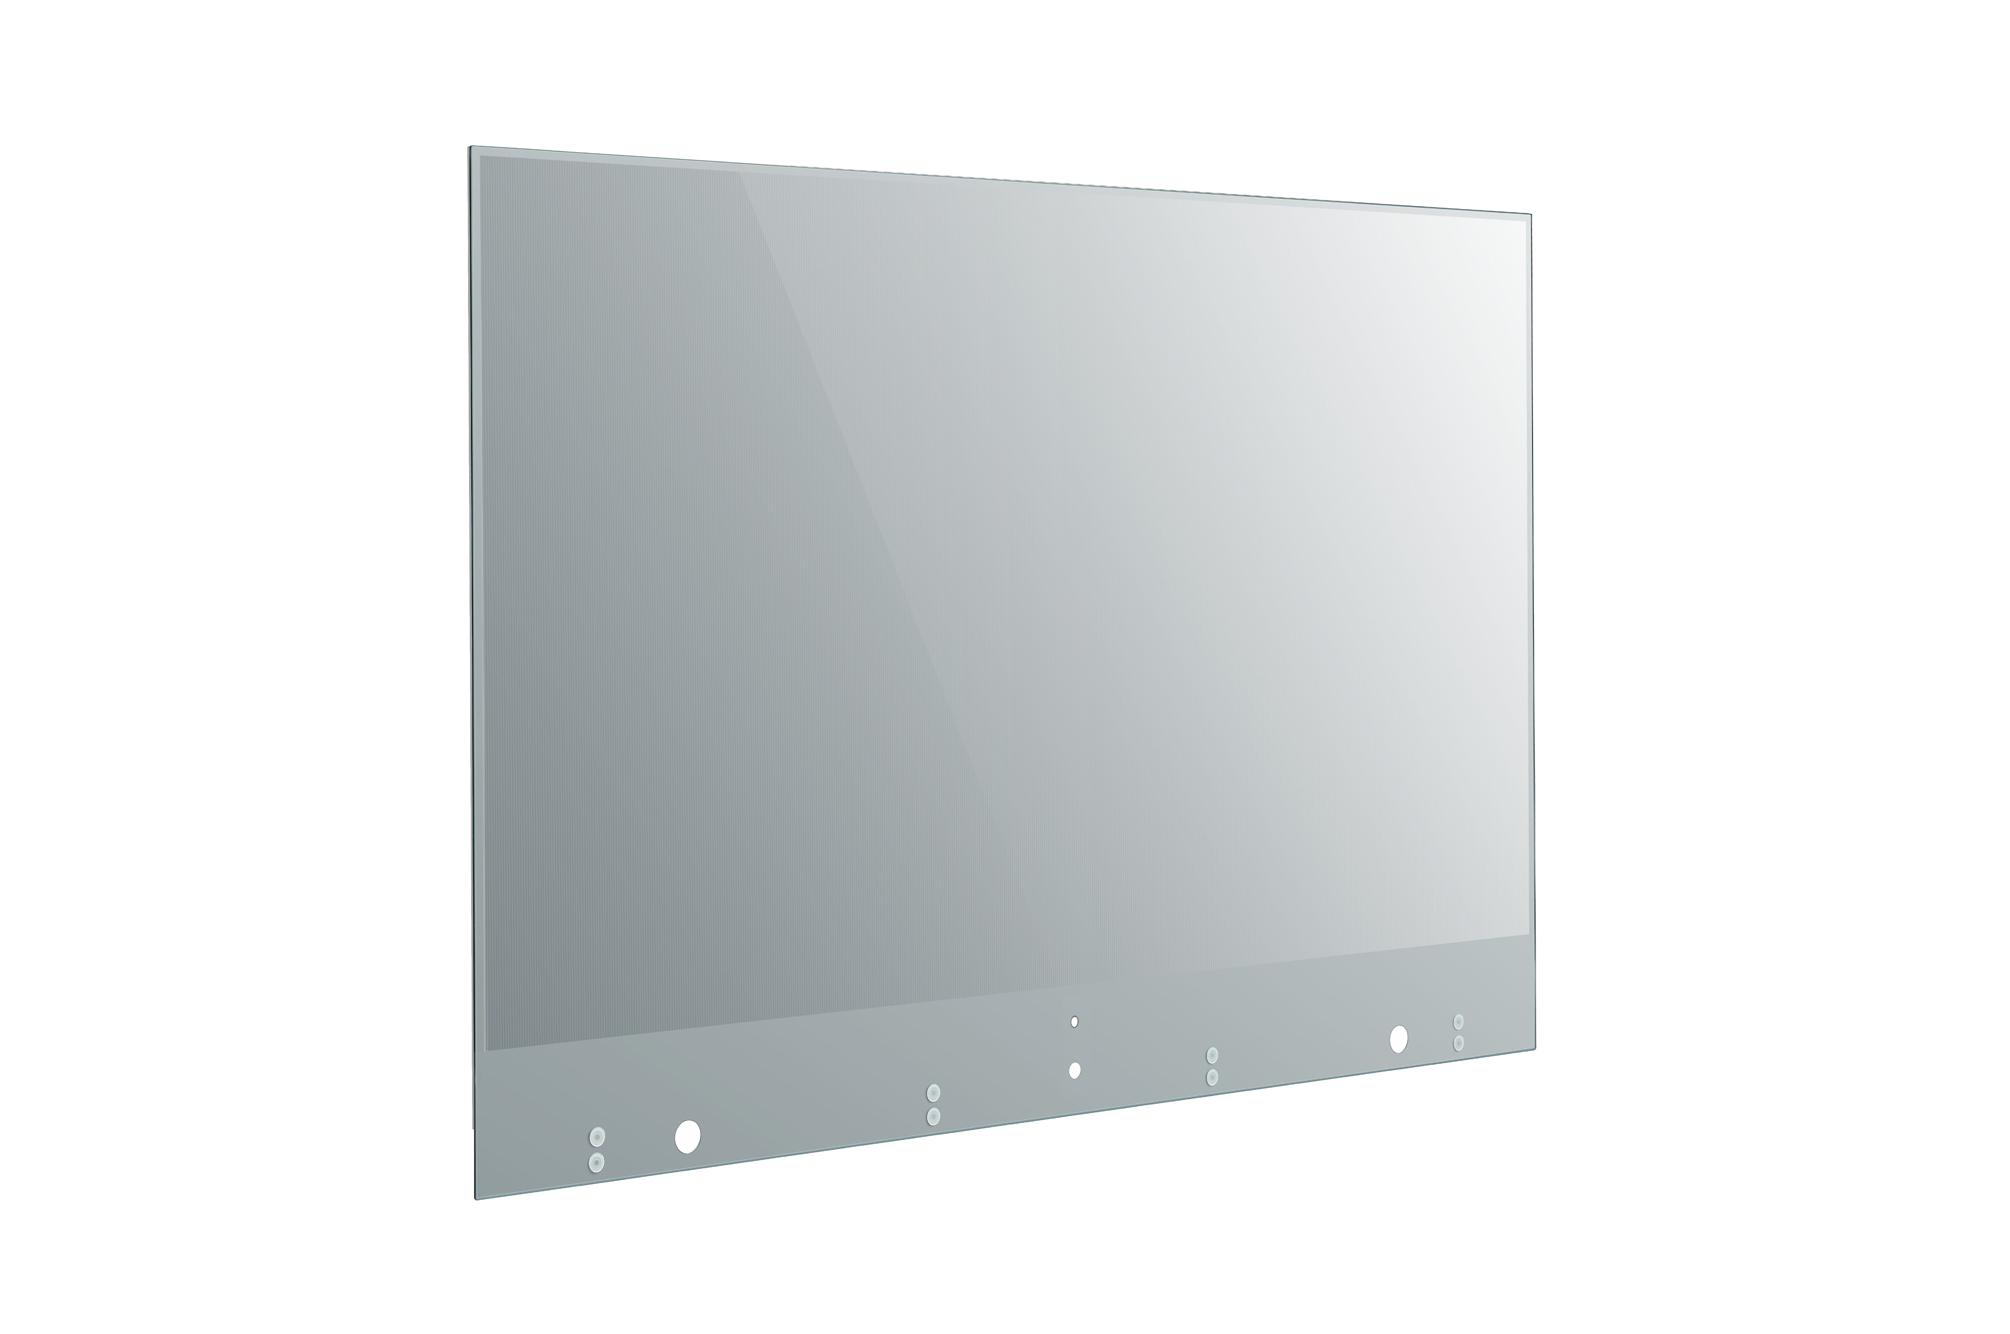 LG Transparent 55EW5F-A